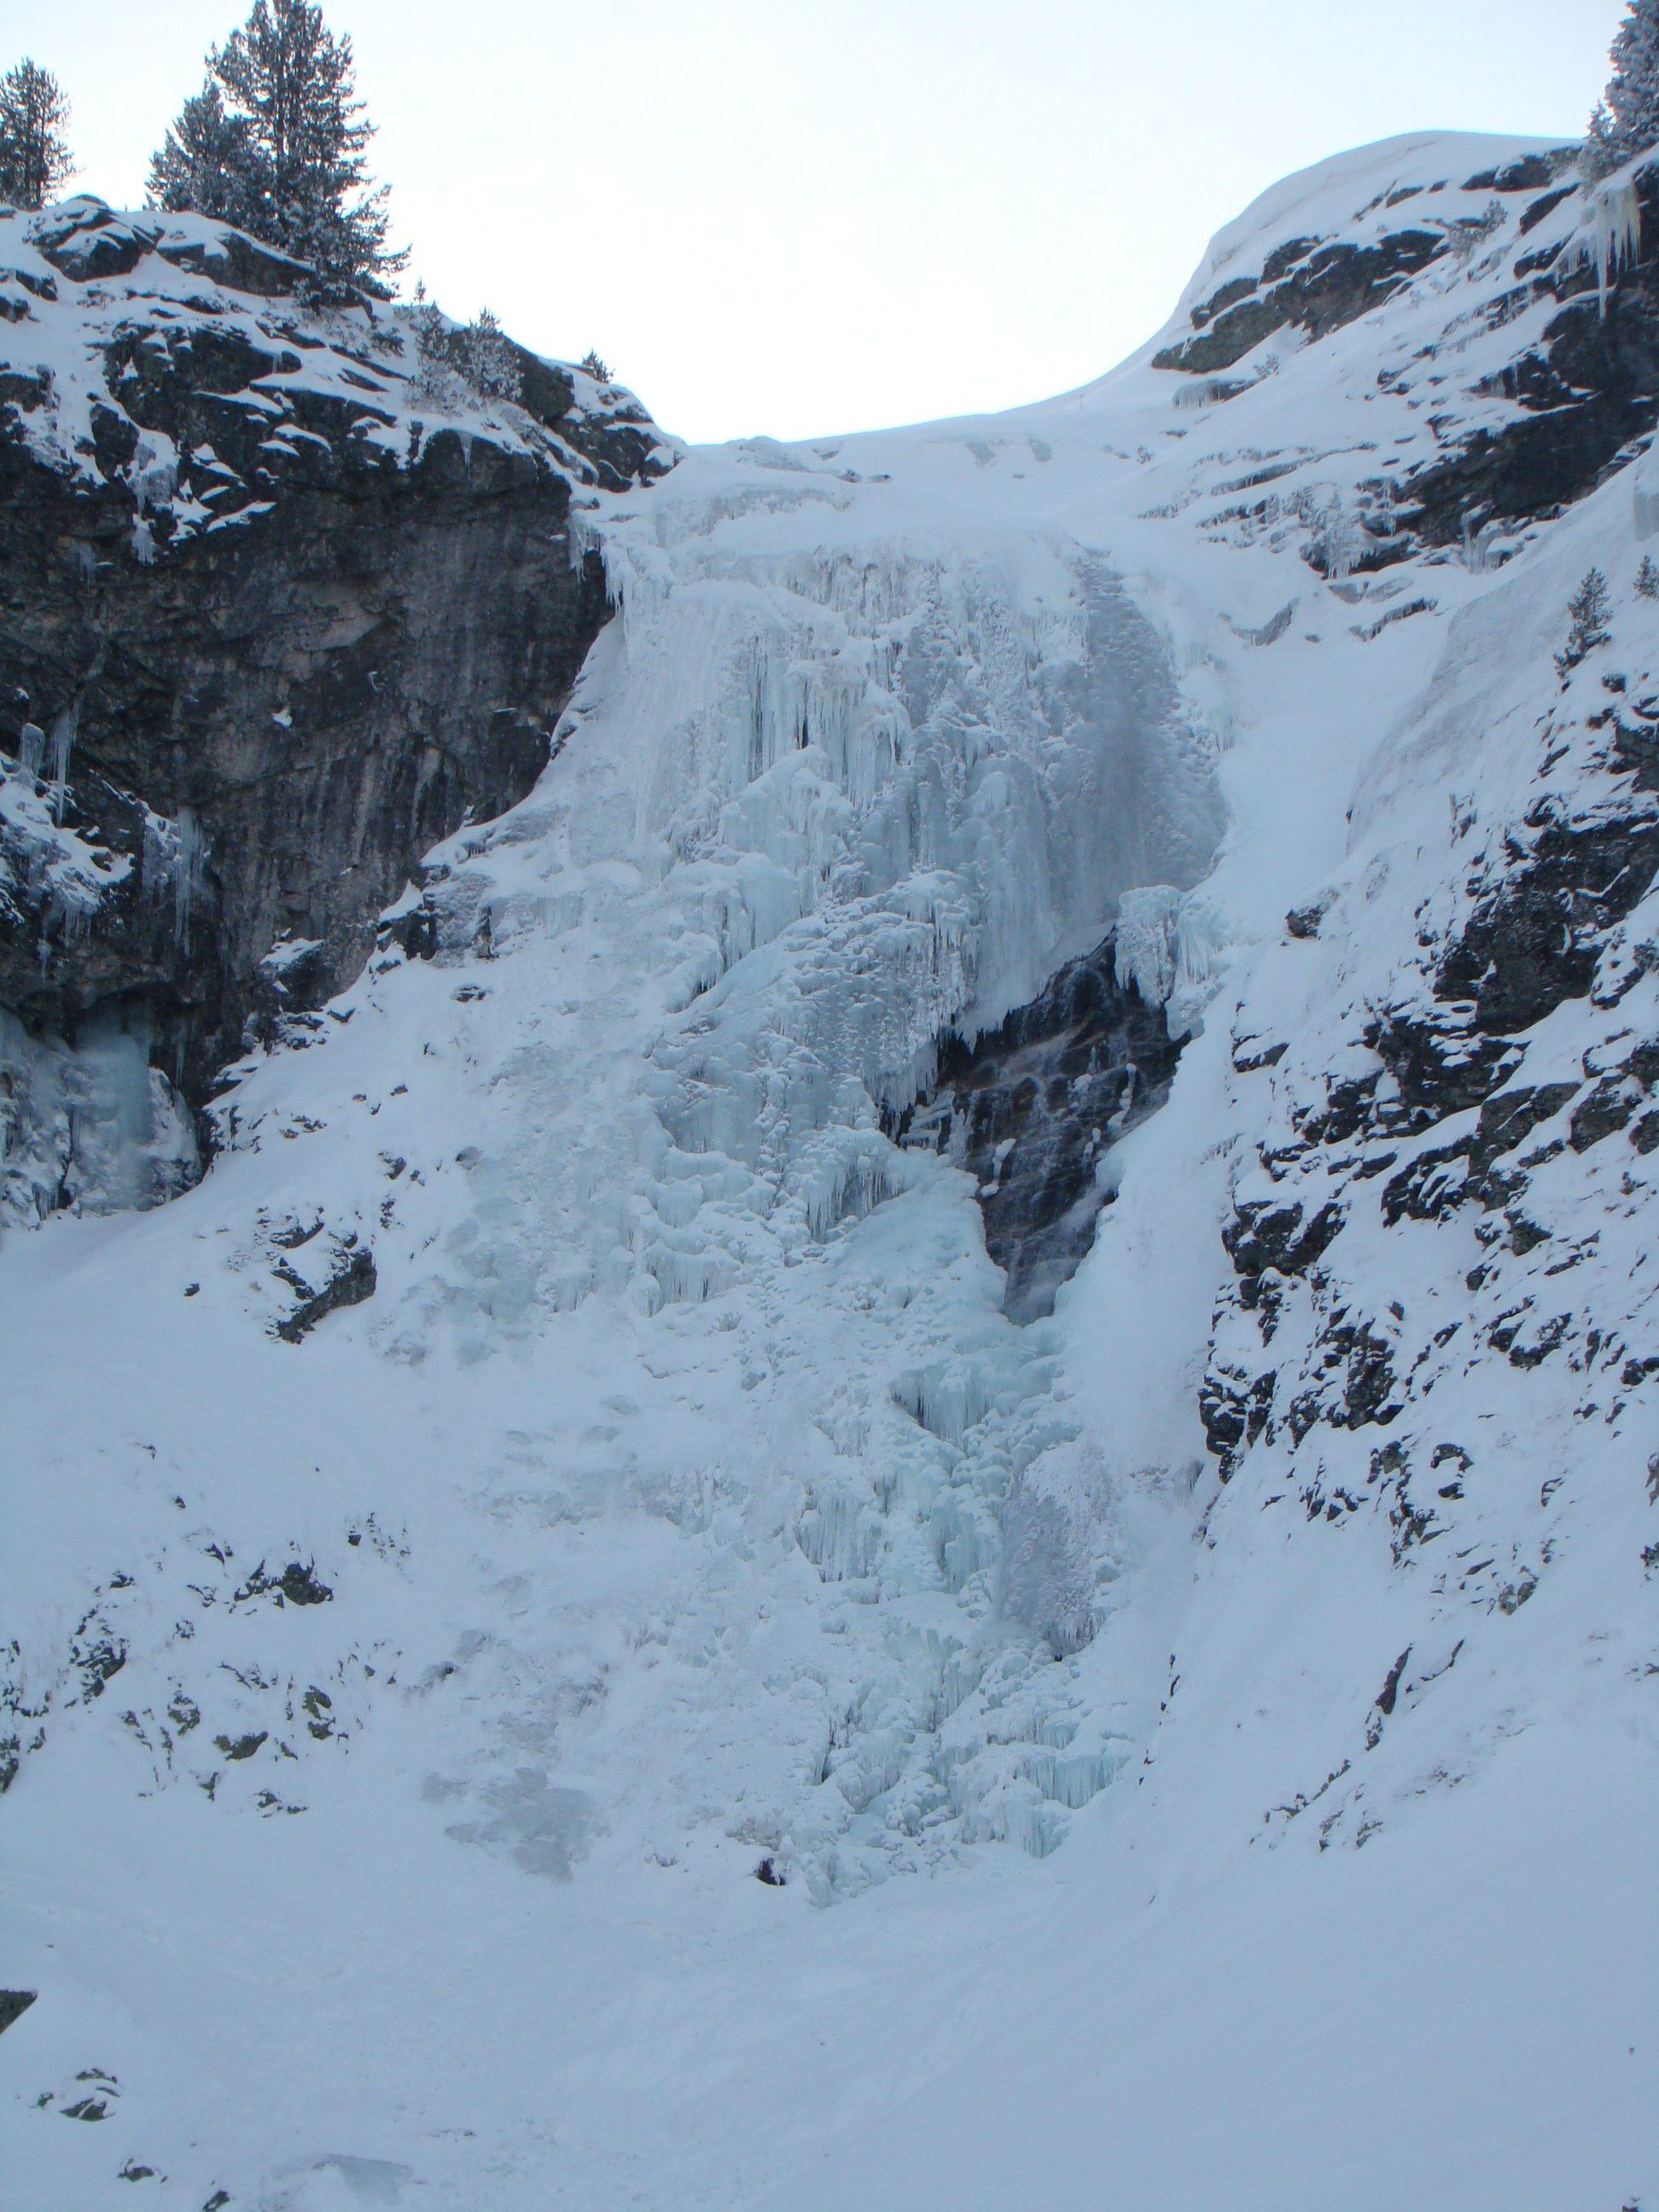 The frozen waterfall of Skakavitsa